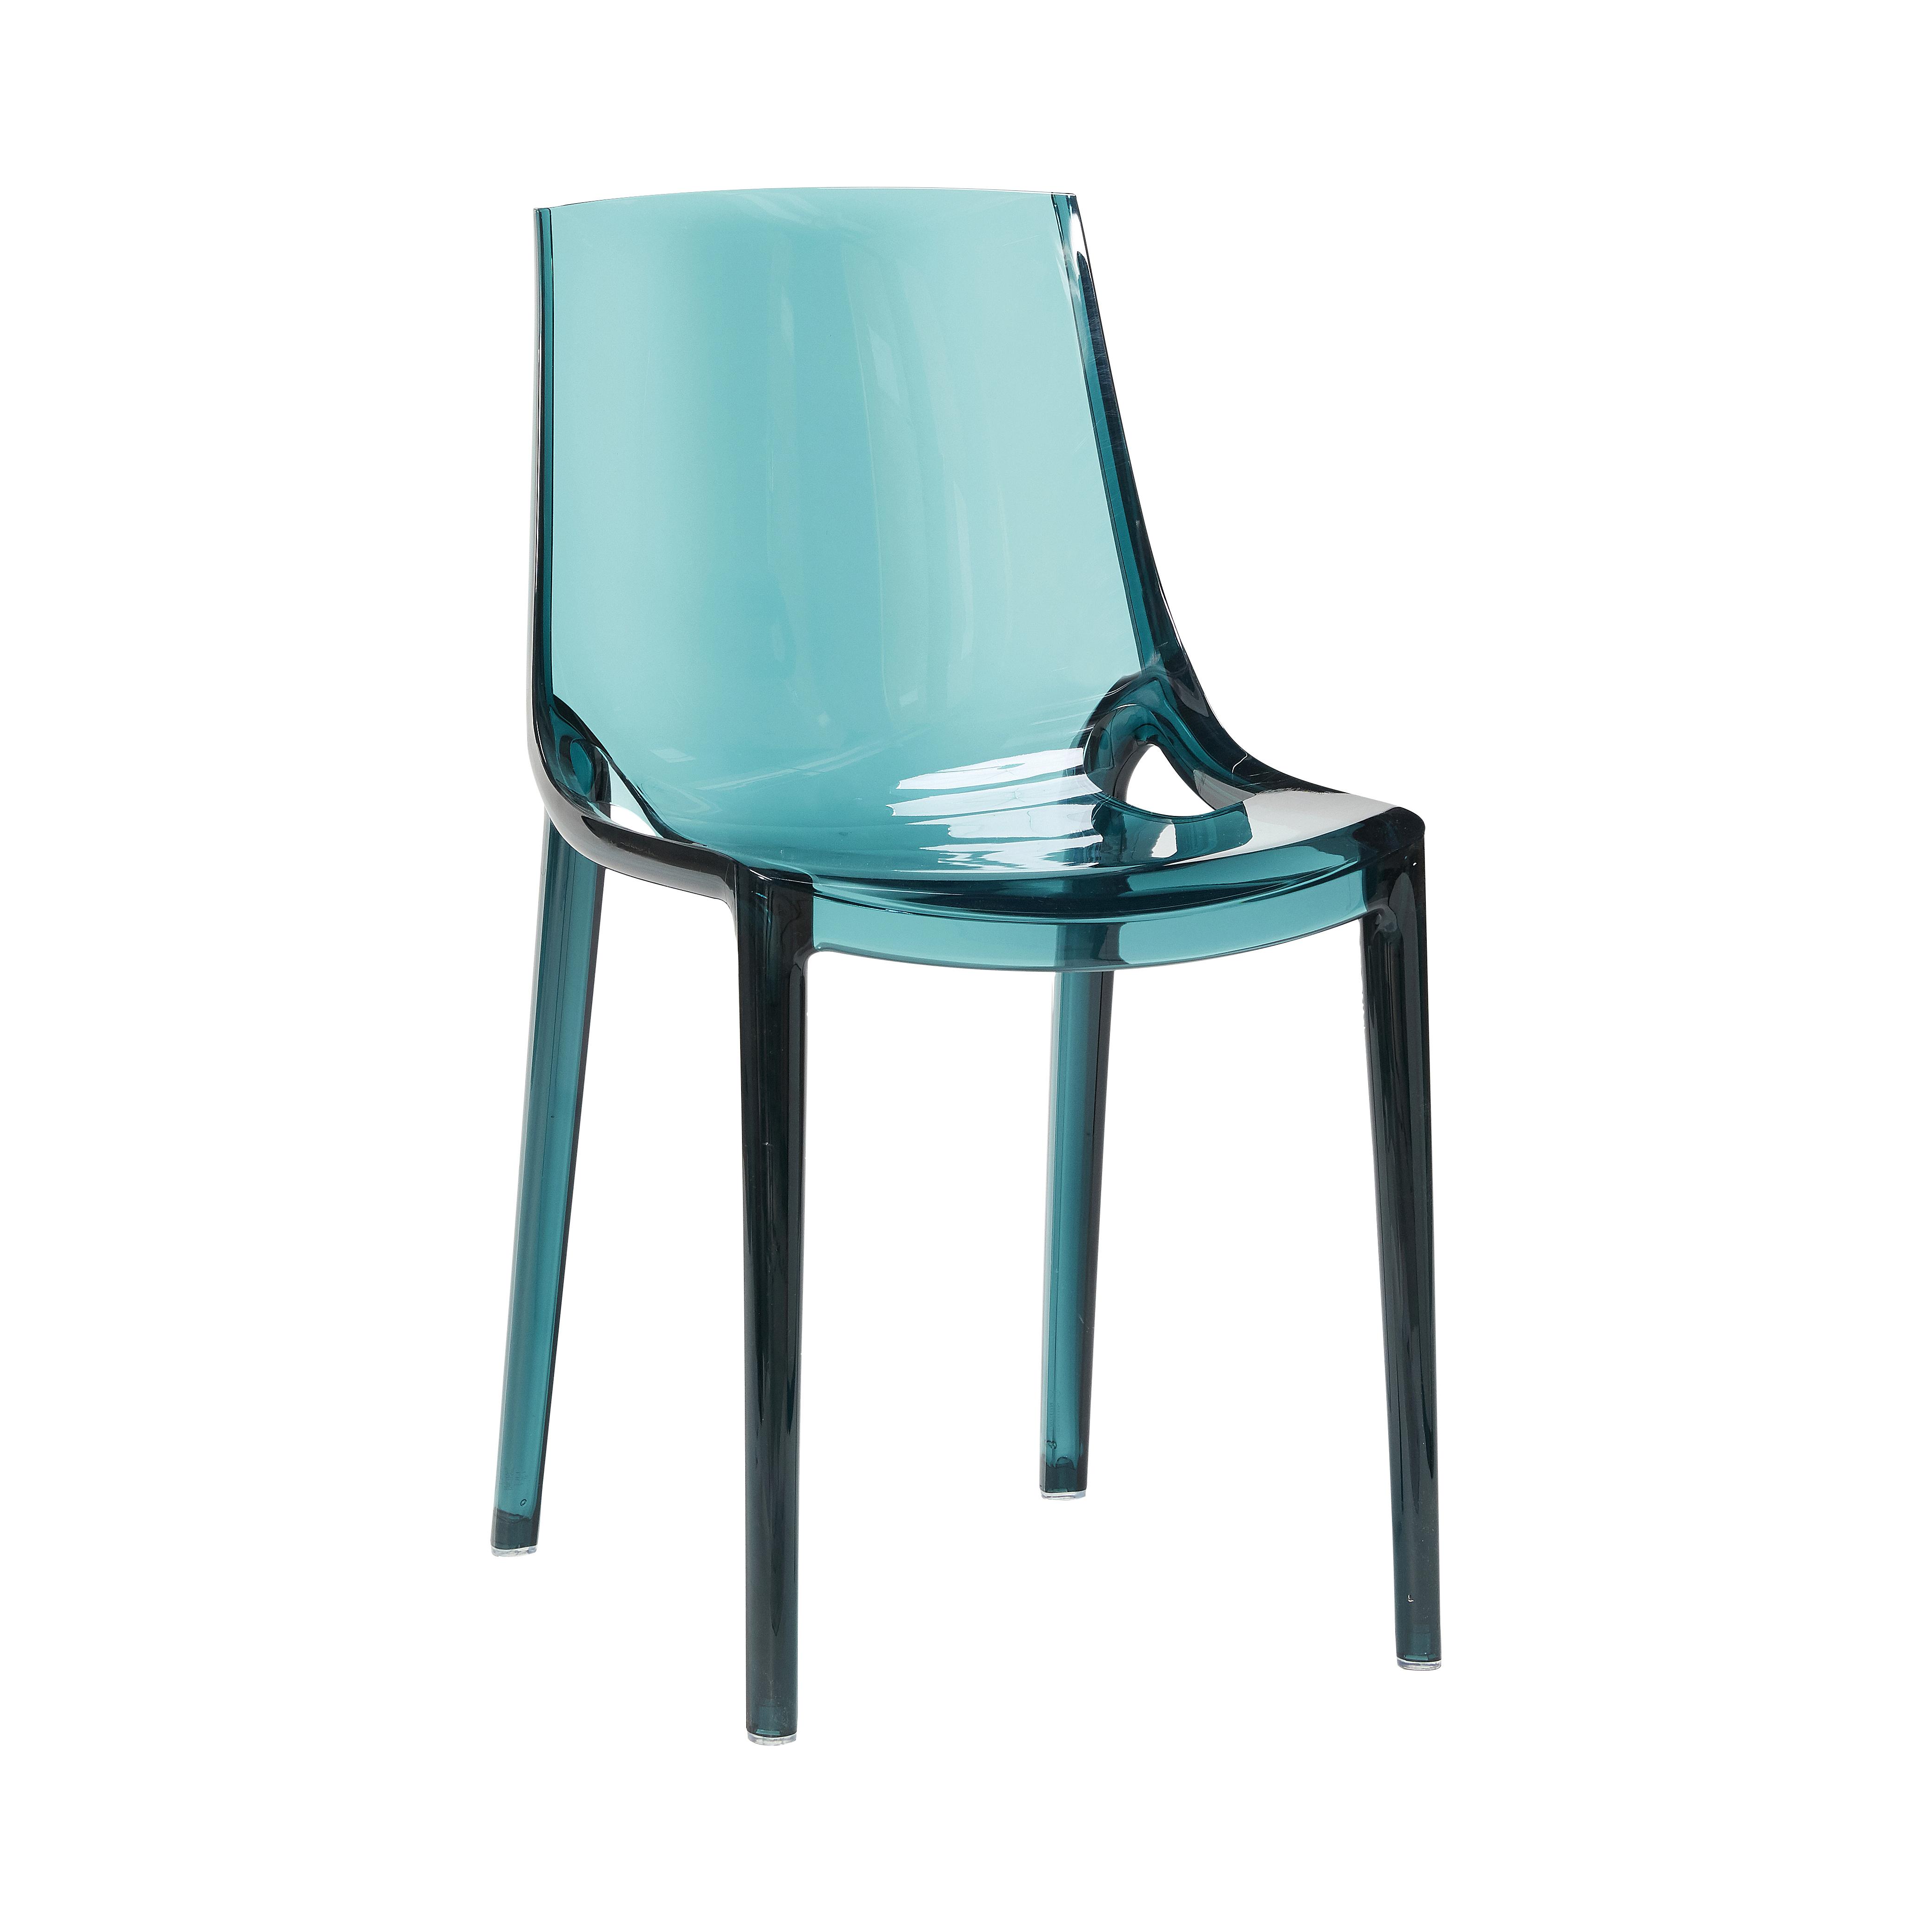 Hübsch Seoul plastik stol / grøn